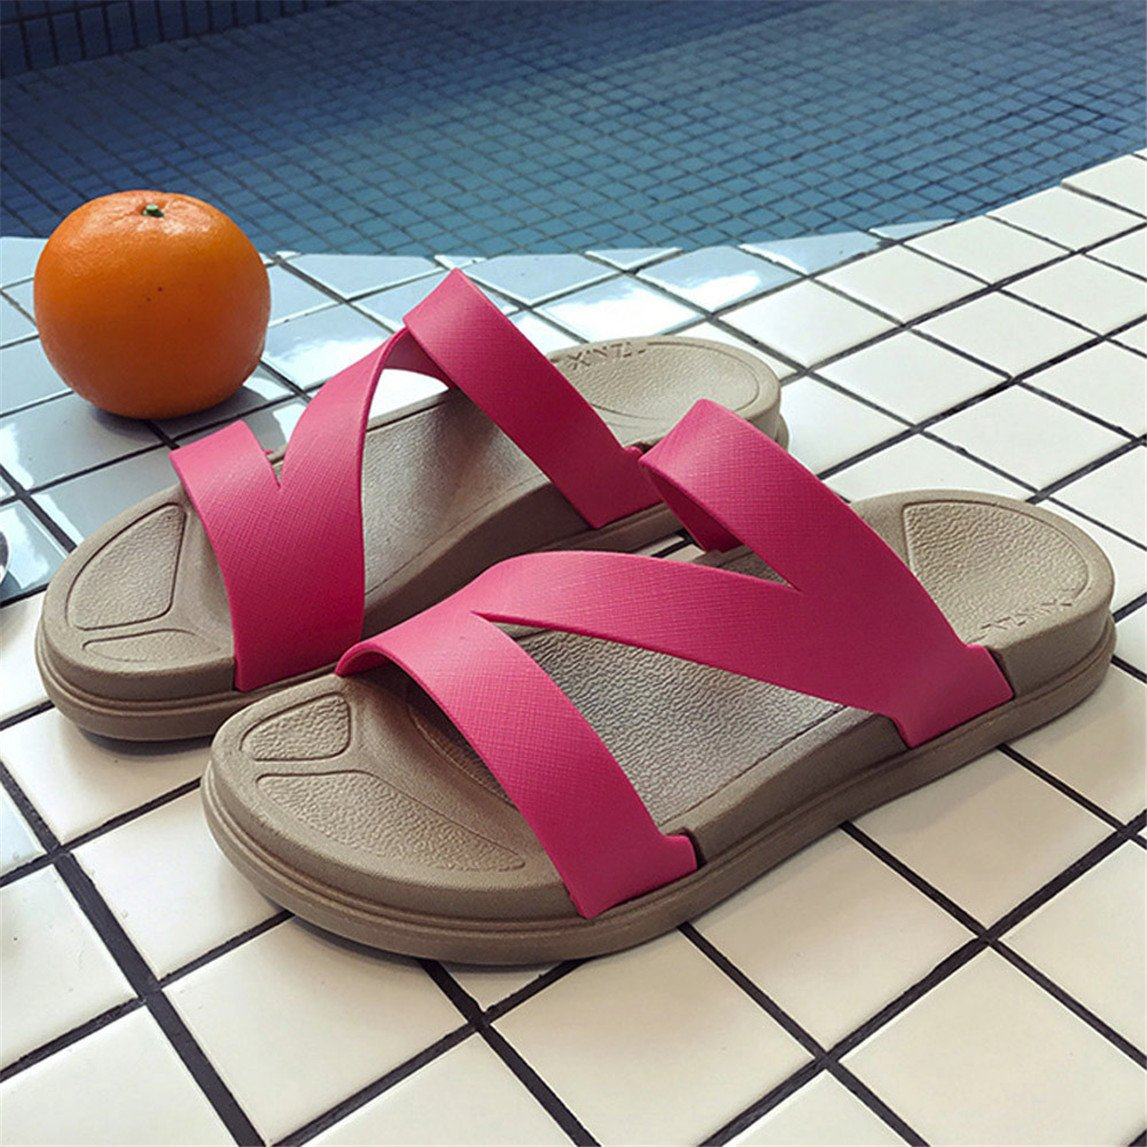 2018 New Ladies Summer Beach Bath Slippers Casual Wedge Sandals Women Shoes B07BNN4HCY 5.5 B(M) US|Hot Pink